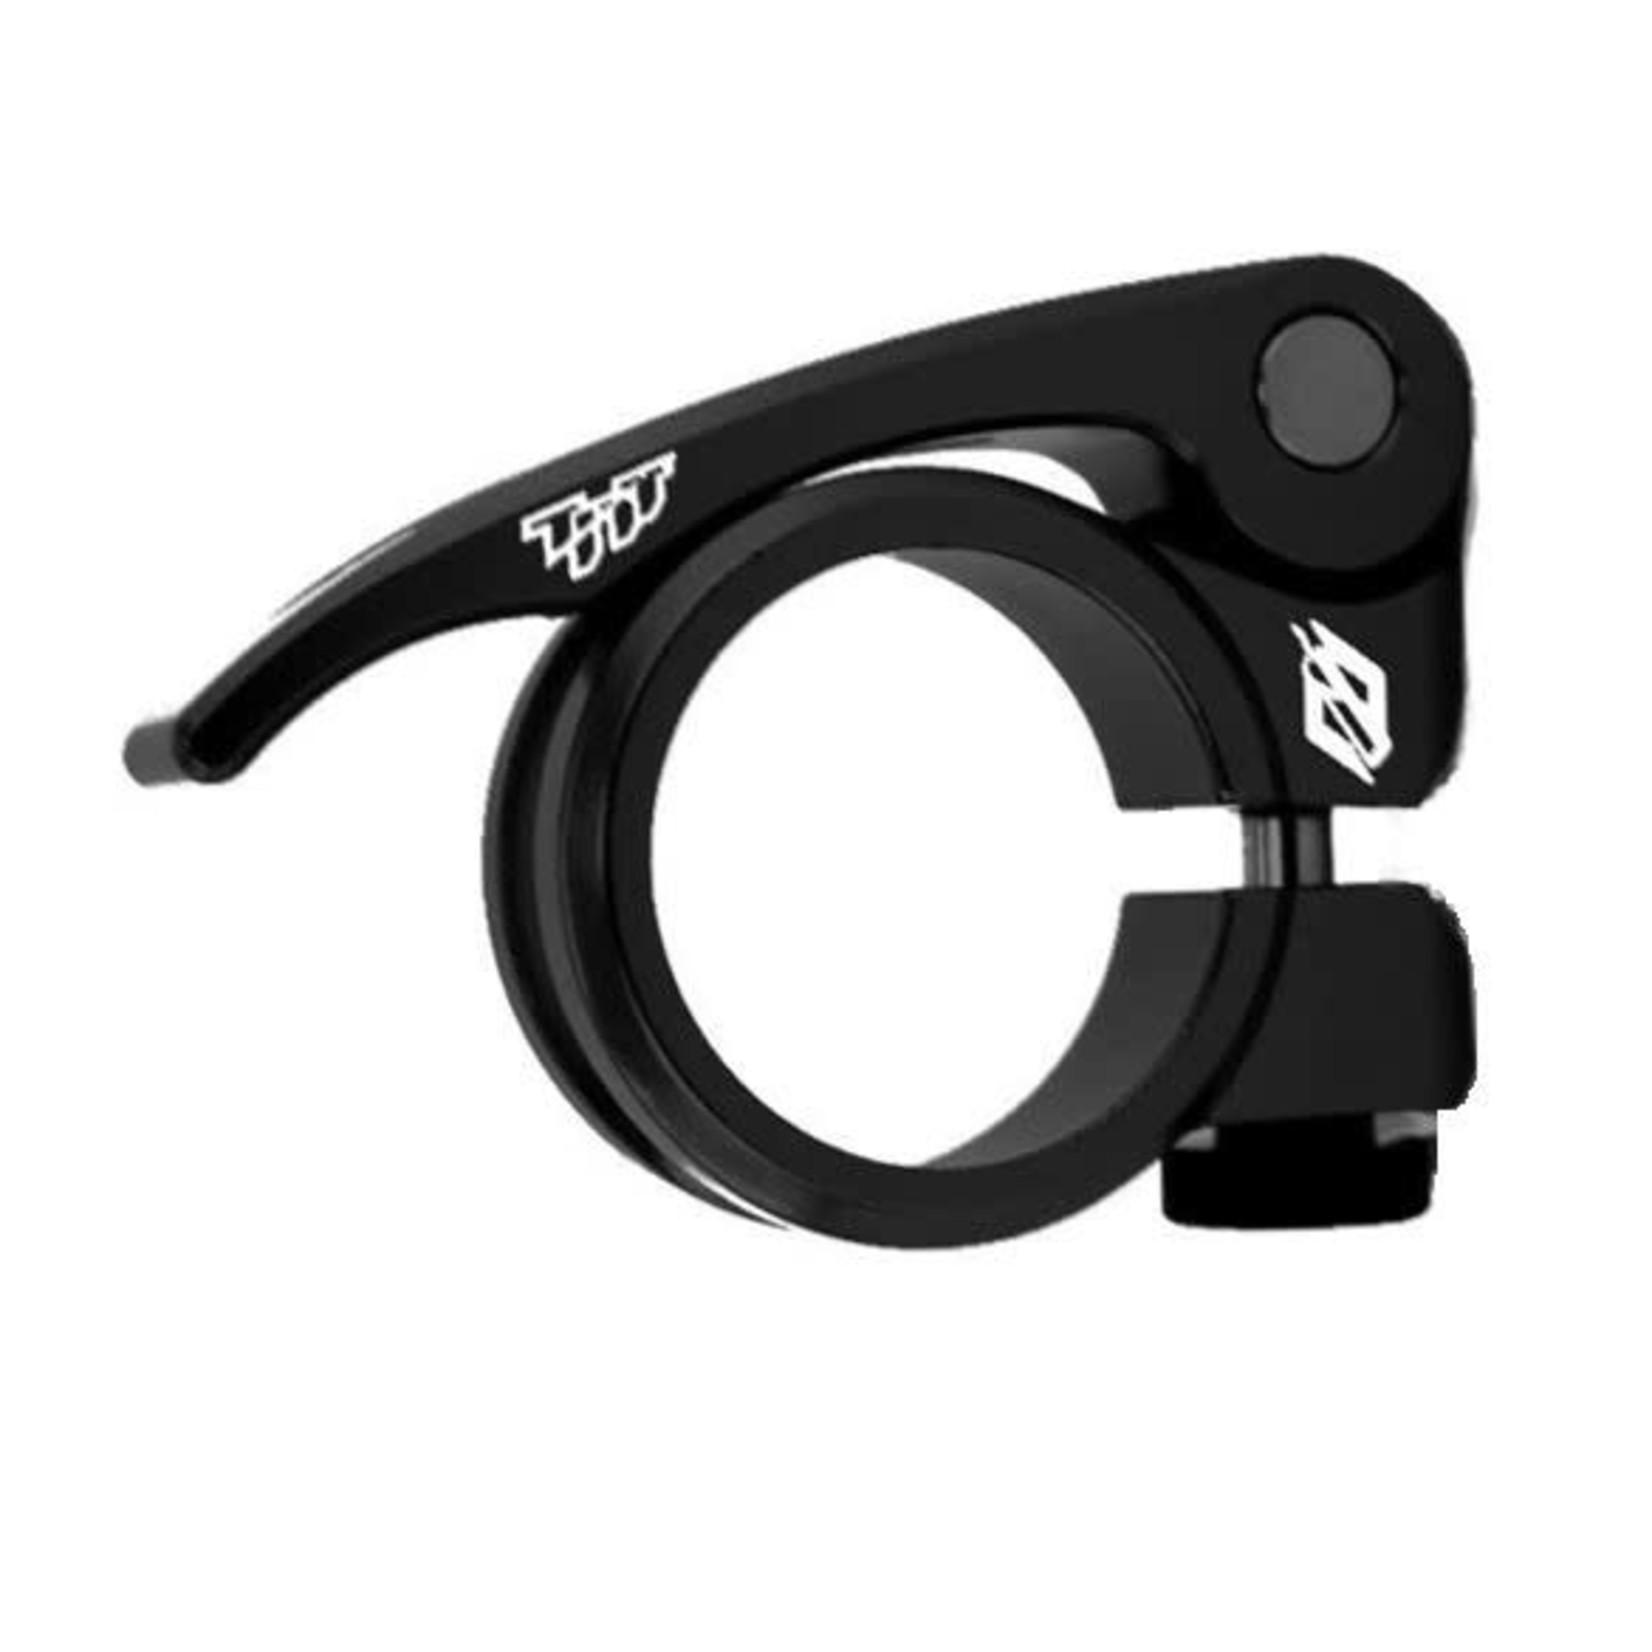 TNT Quick Release Seat Clamp 1-1/4 Black